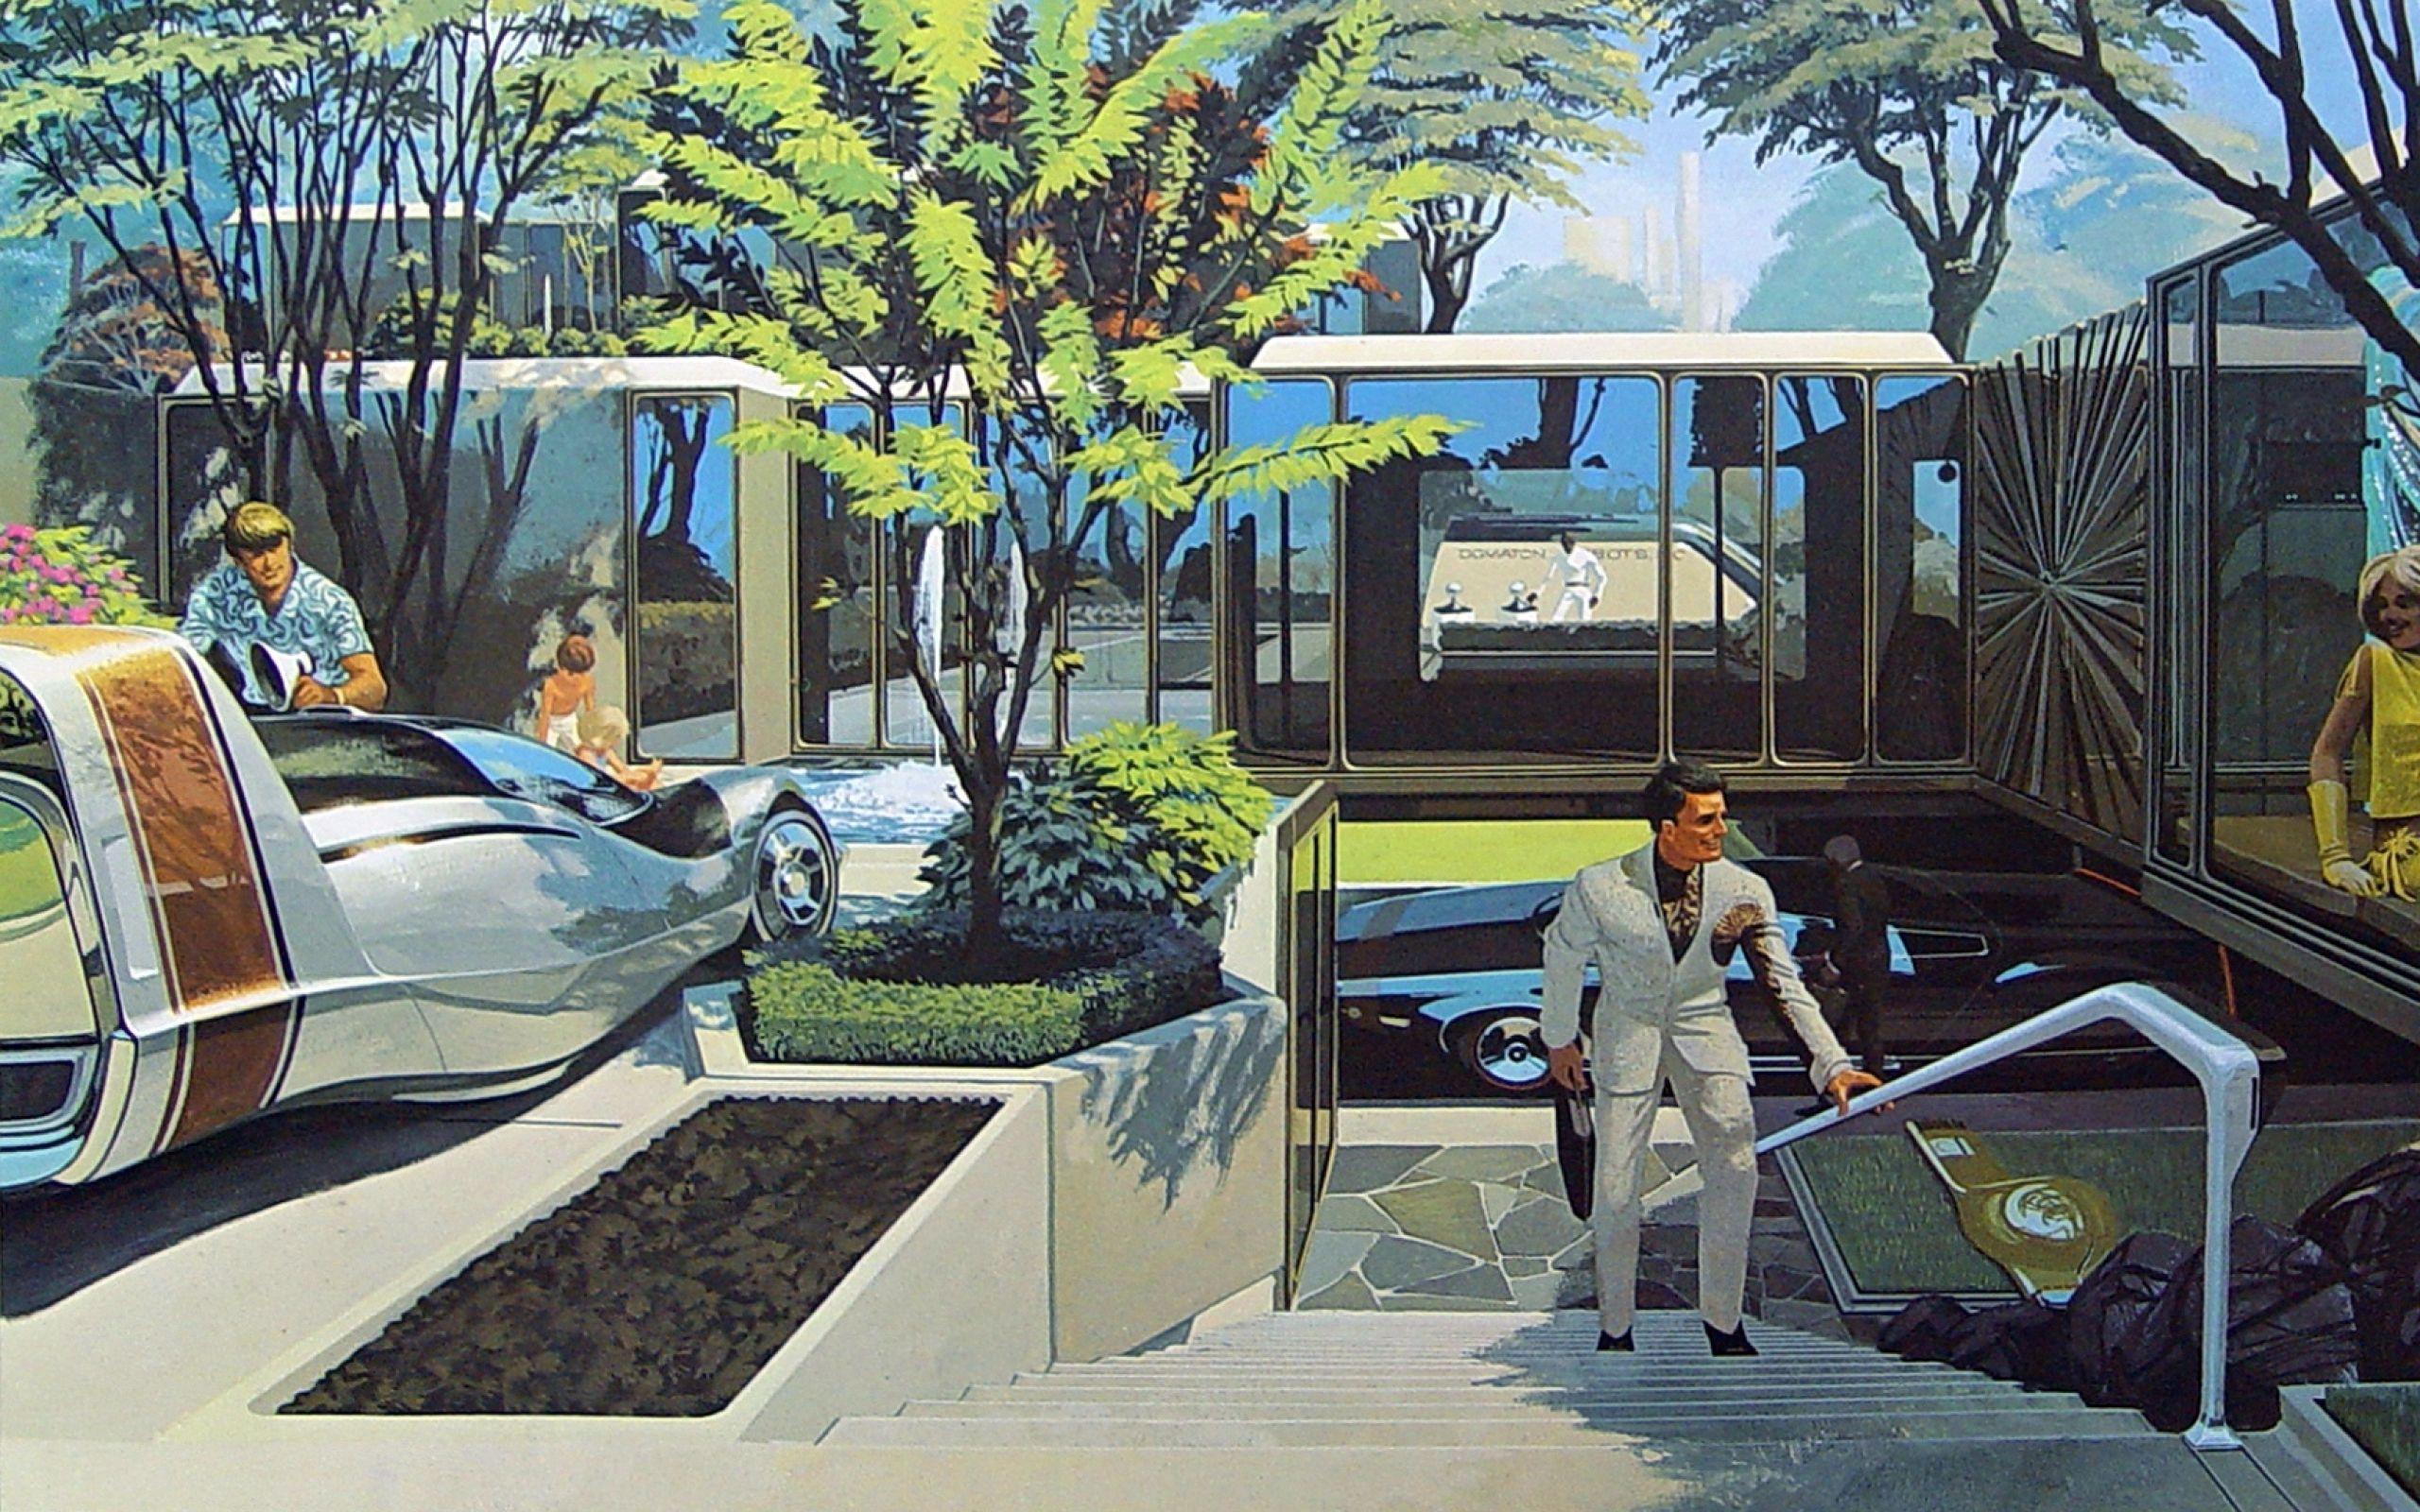 syd mead futurism garden blunkett l 2013 http www